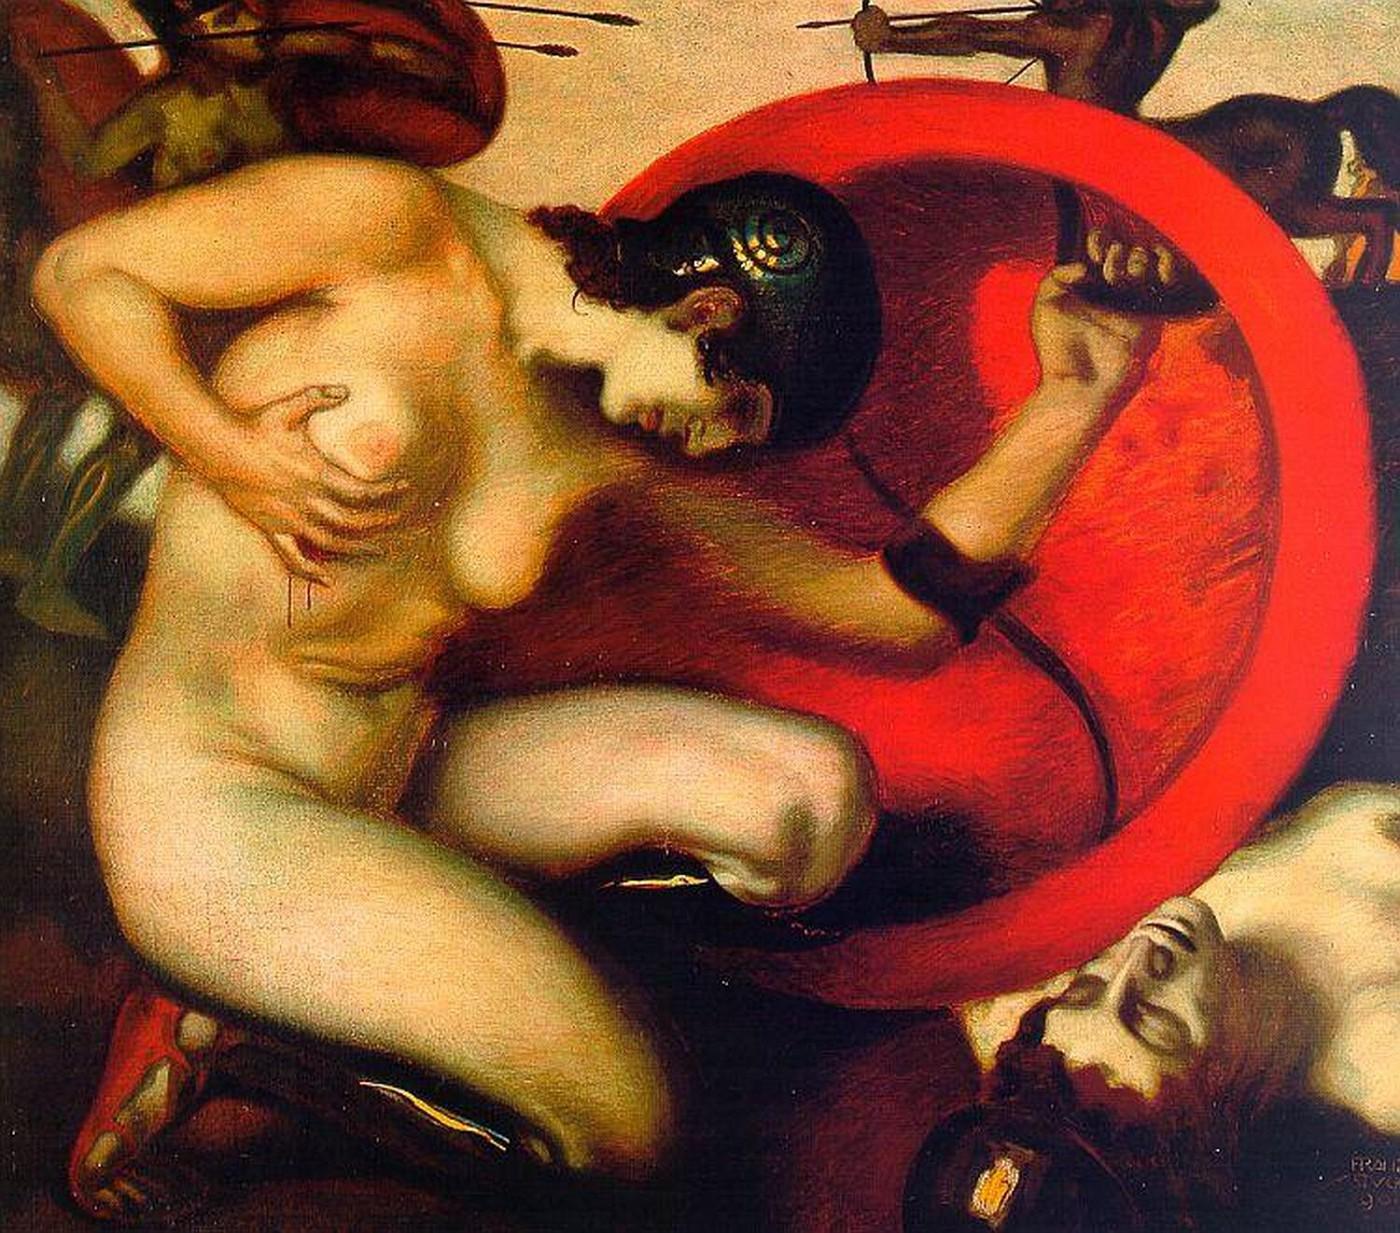 Porno photo amazones nude pics